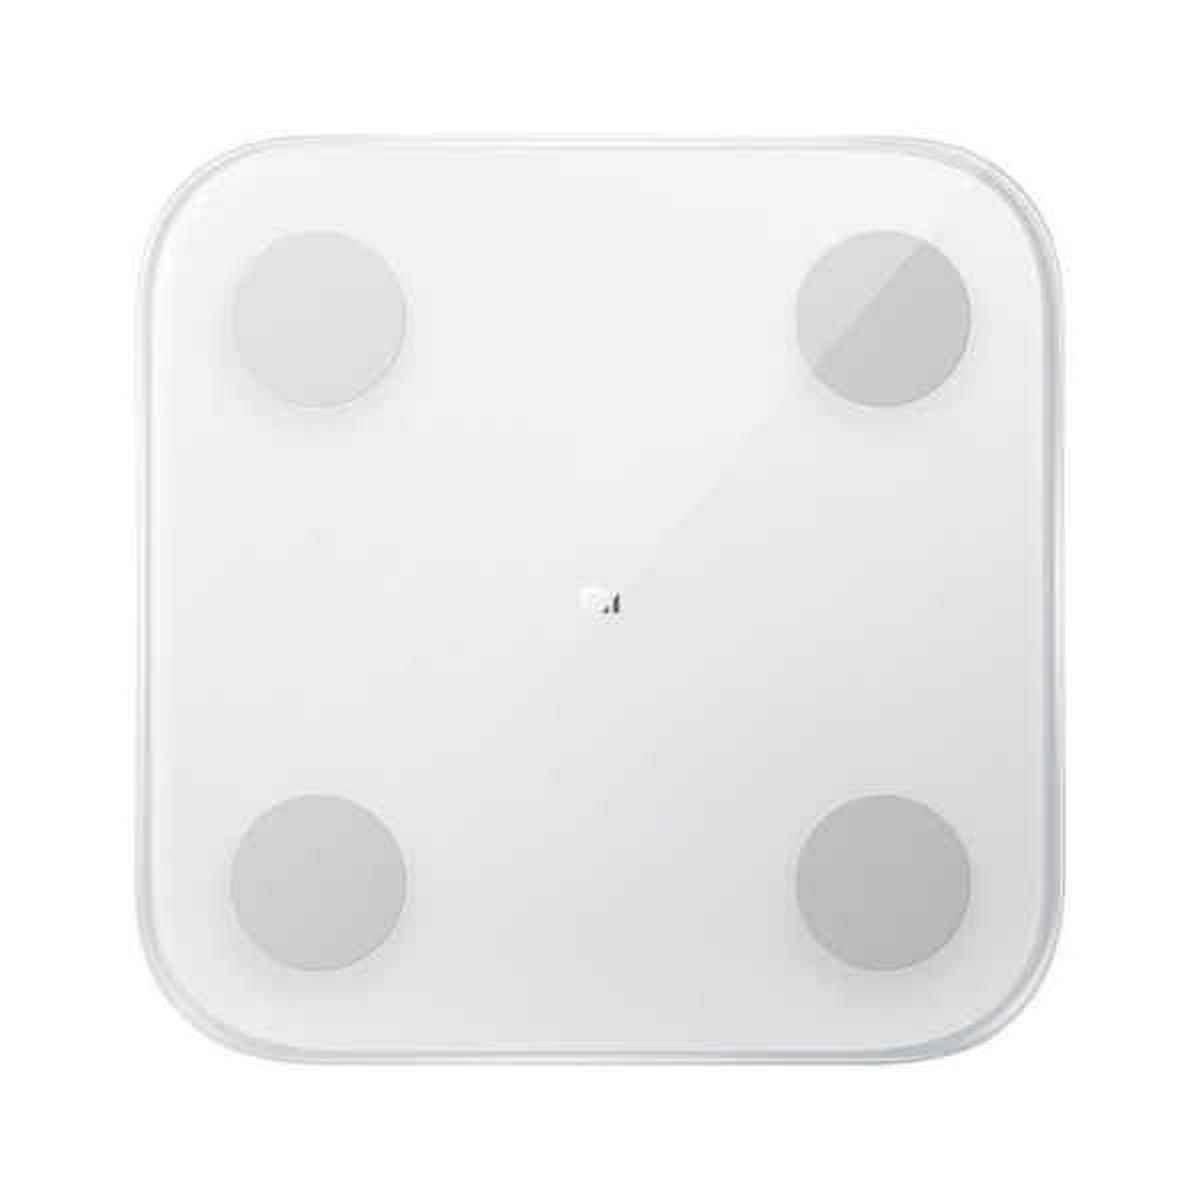 main images ترازو هوشمند شیائومی مدل Mi-Composition-Scale2 Xiaomi Mi-Composition-Scale2 smart scale